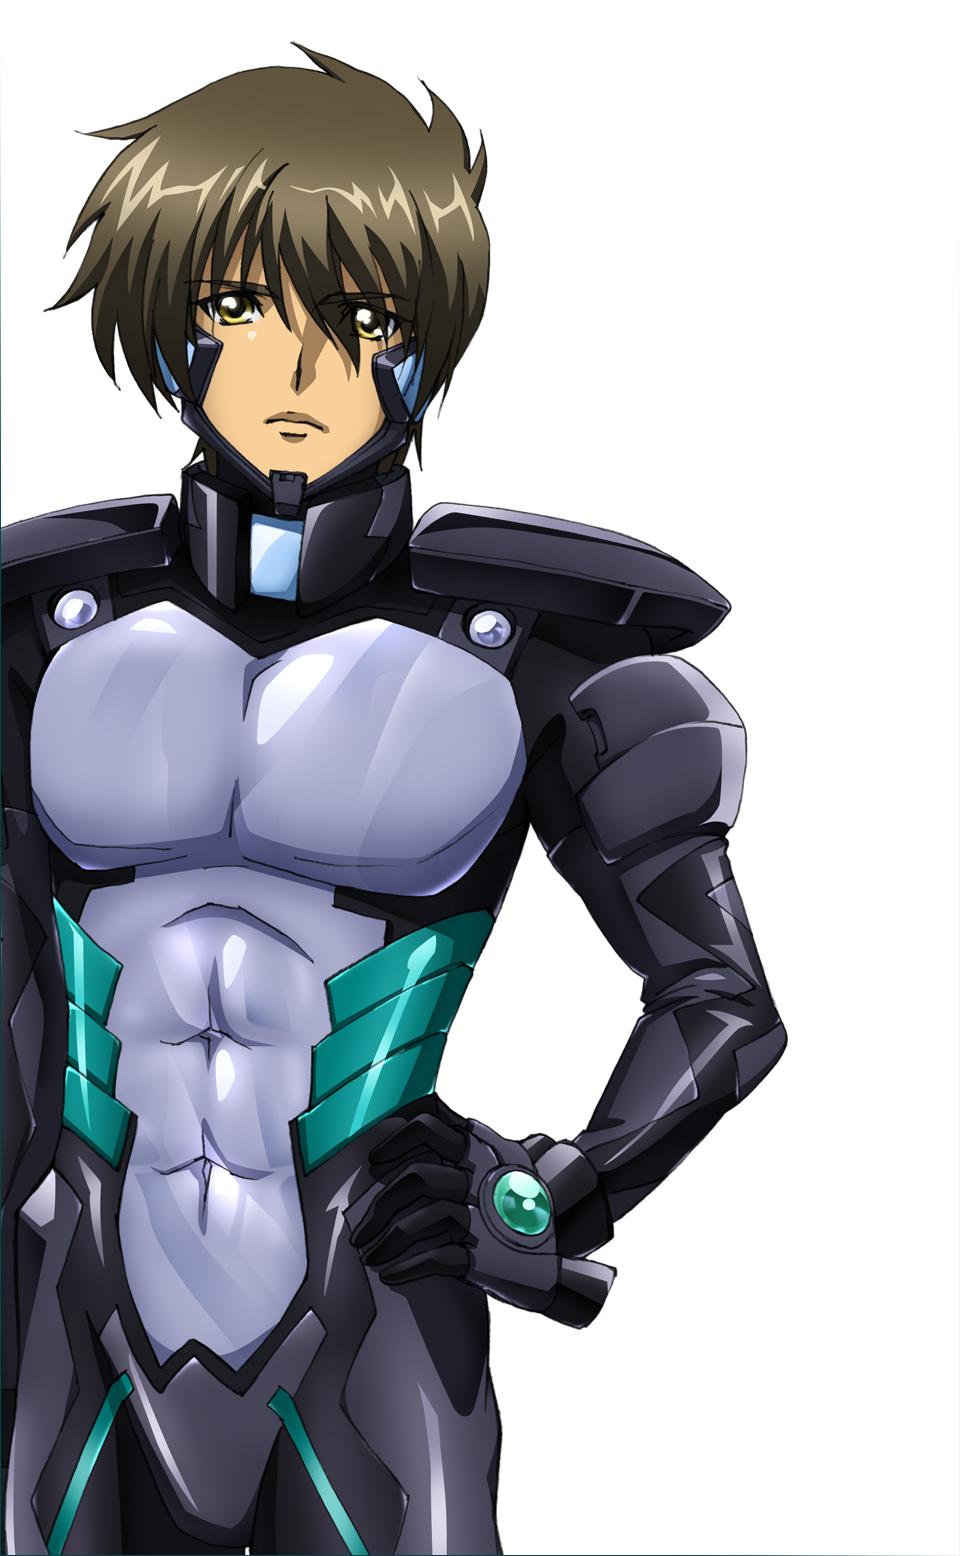 YUI_Muv-Luv Alternative - Total Eclipse - Zerochan Anime Image Board